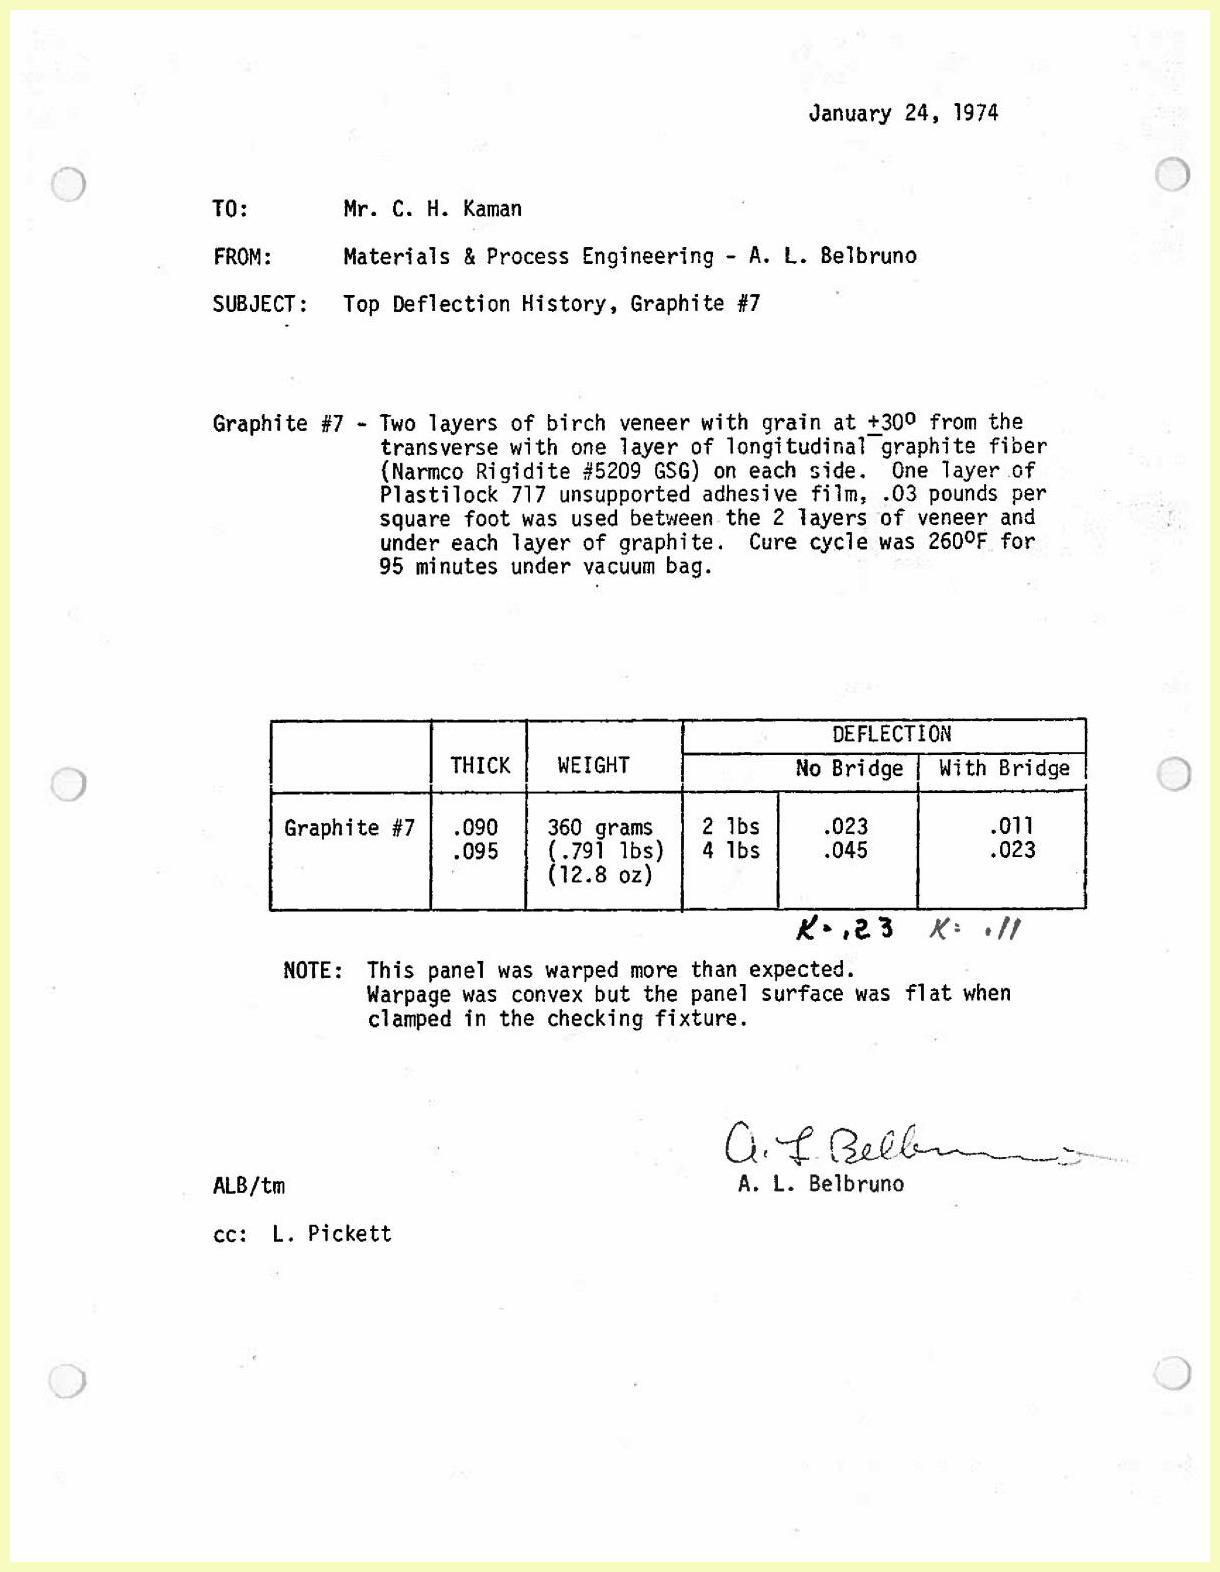 Ovation Adamas Proto #07 Description & Vibrometer Plot